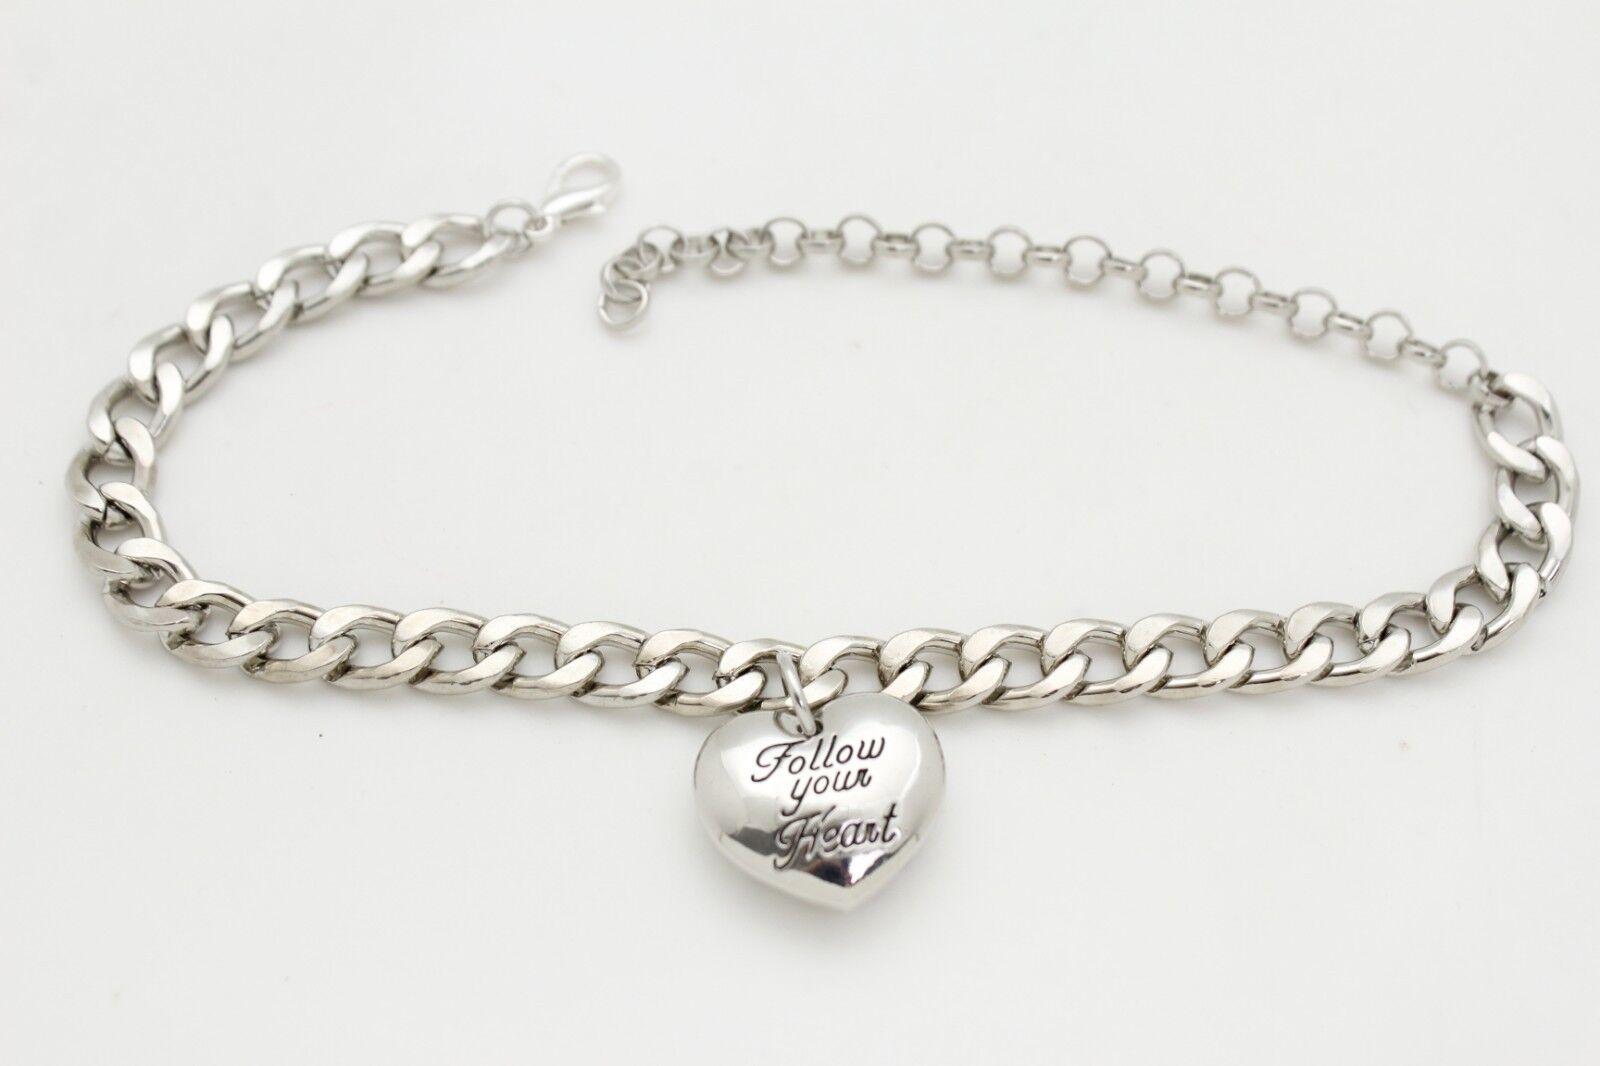 Women Silver Metal Chain Boot Love Bracelet Anklet Shoe Charm Follow Your Heart